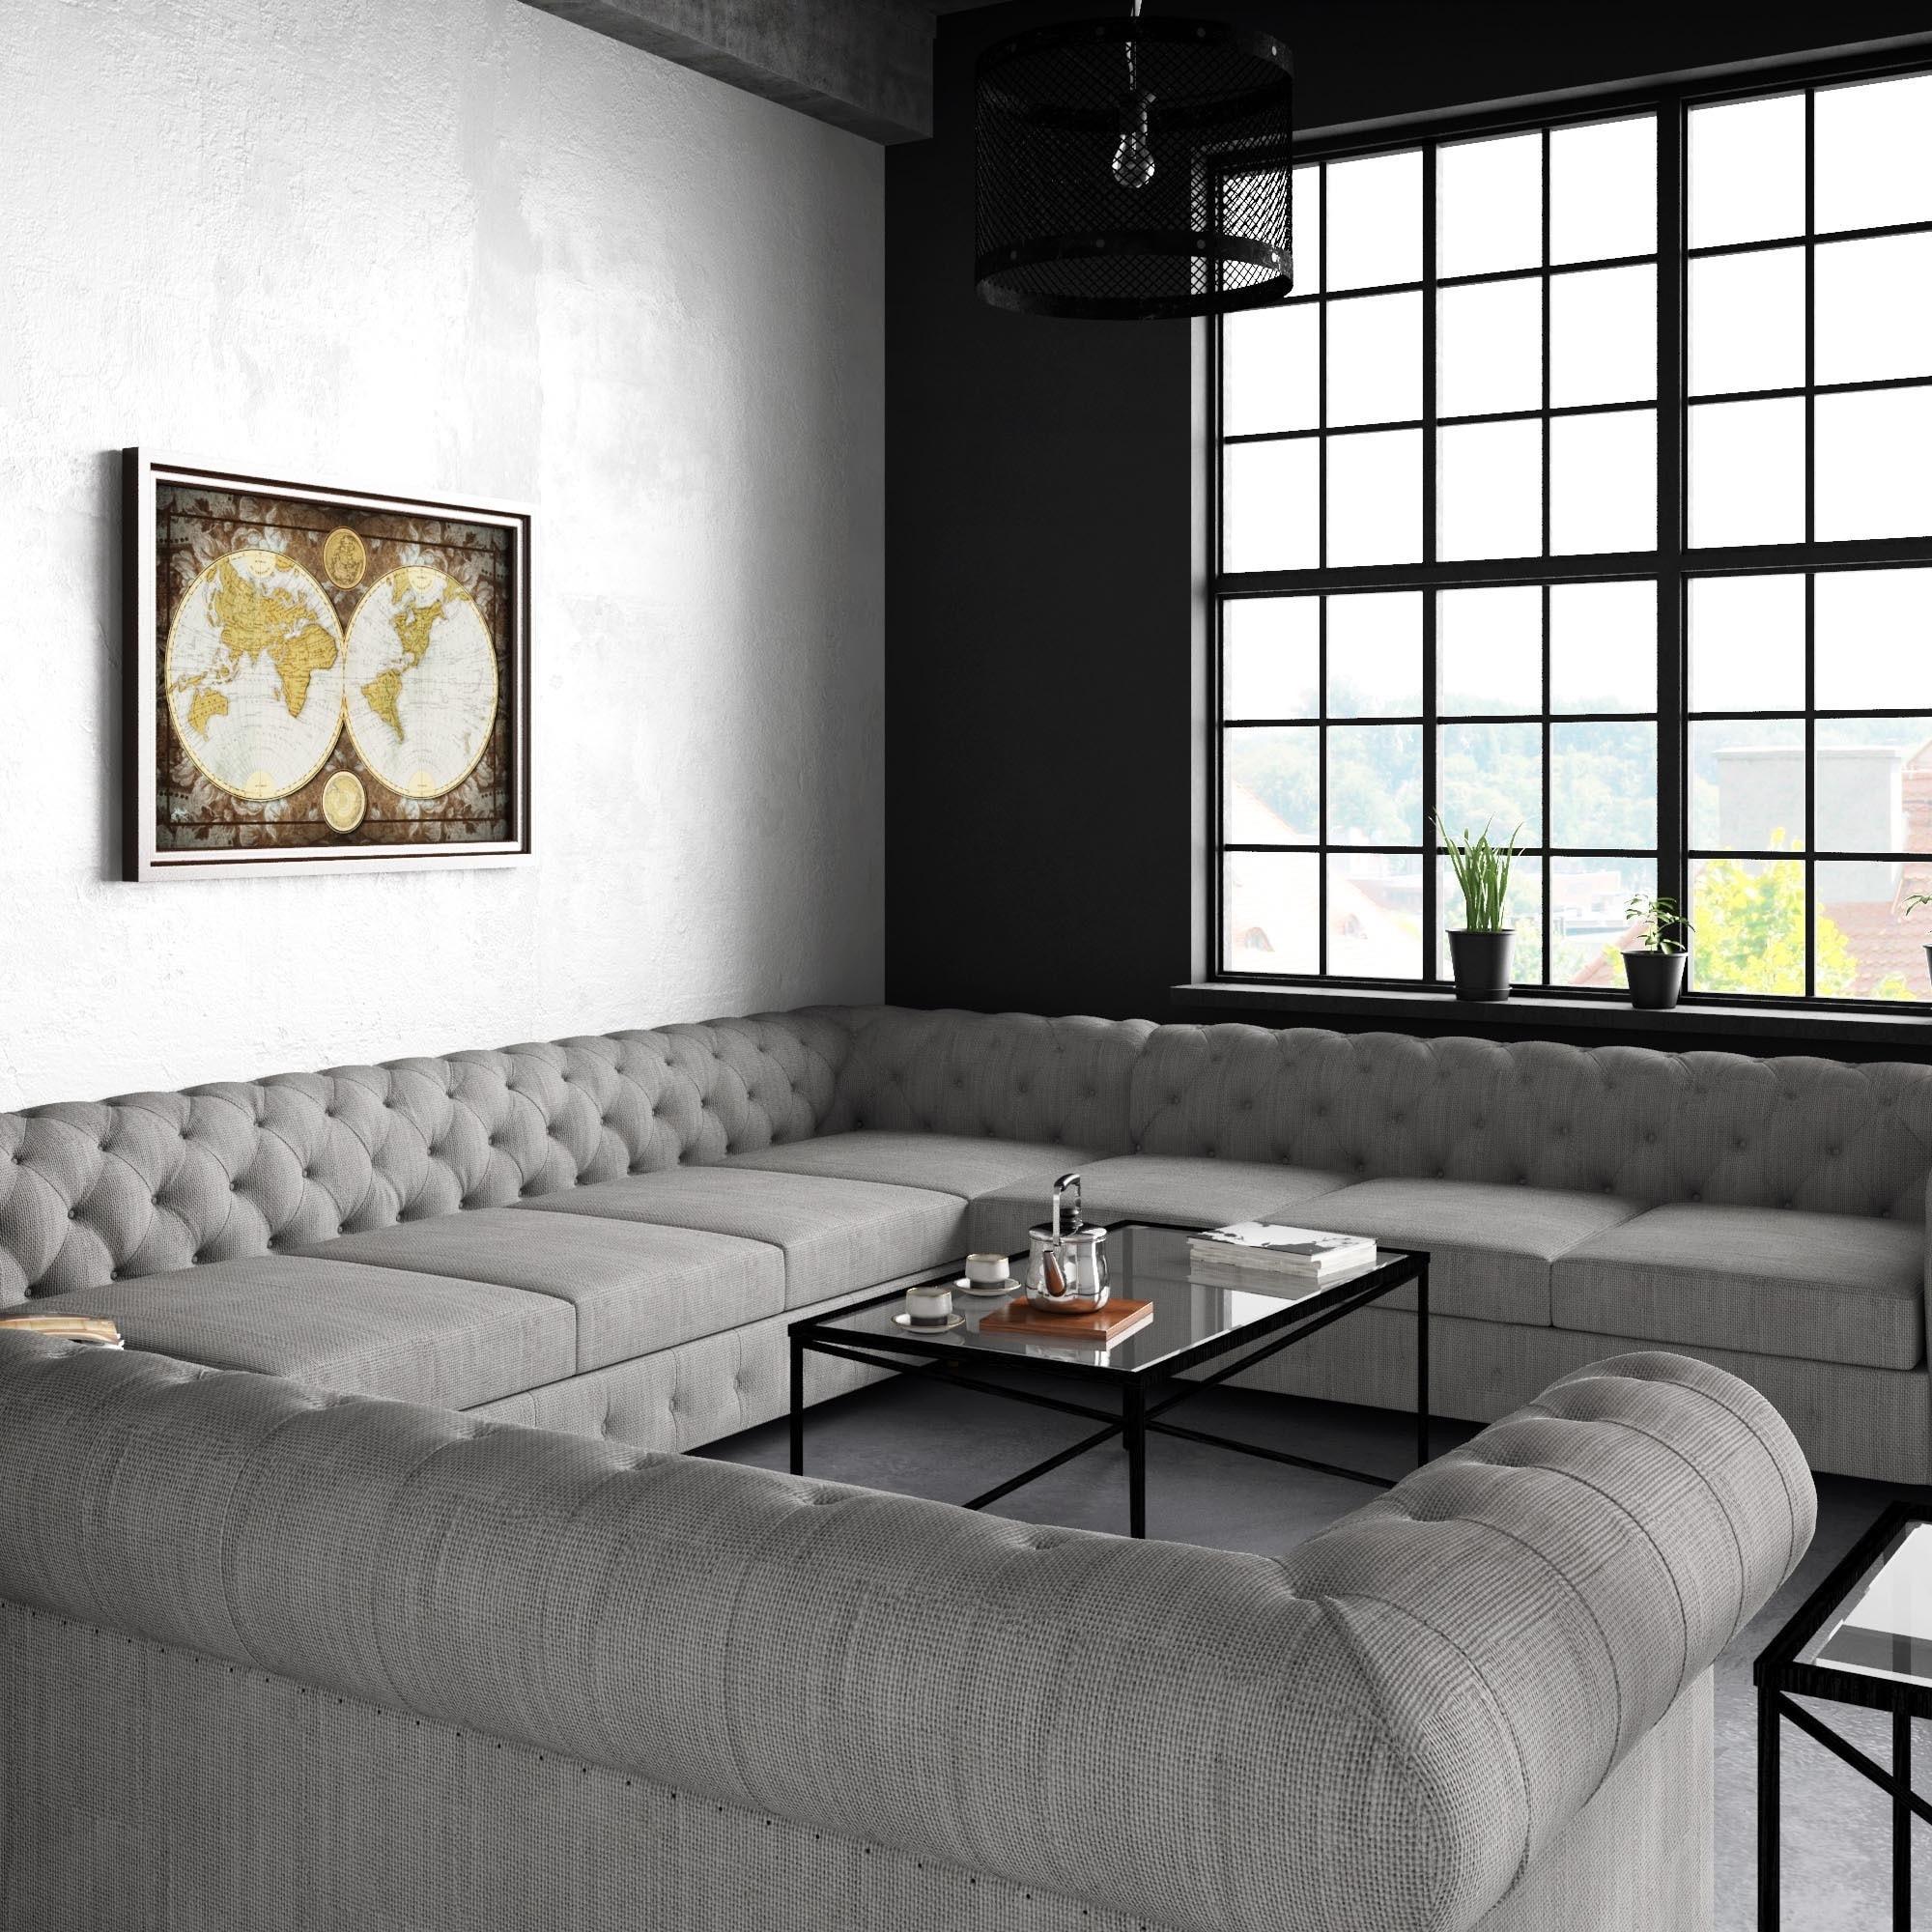 bay sofa harris tweed sofas scotland moser furniture garcia tufted linen u shaped sectional ebay